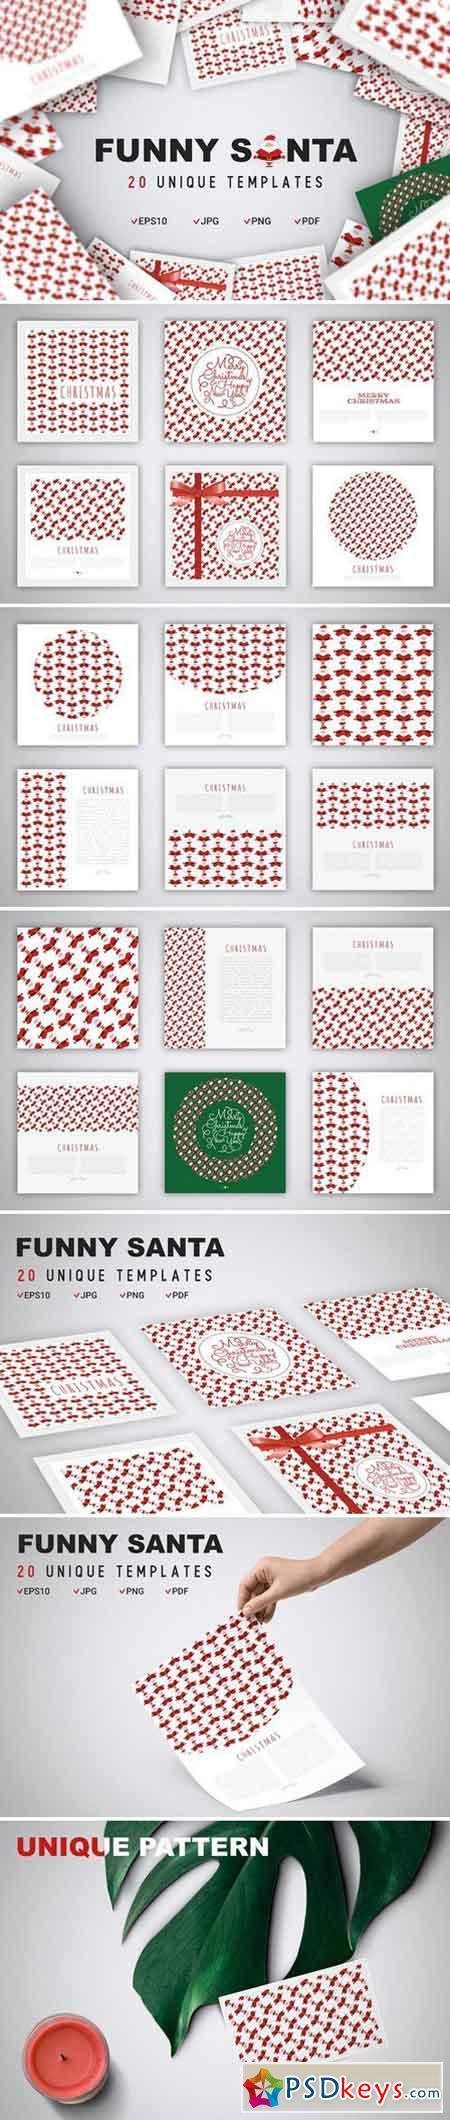 Funny Santa Concept 2113500